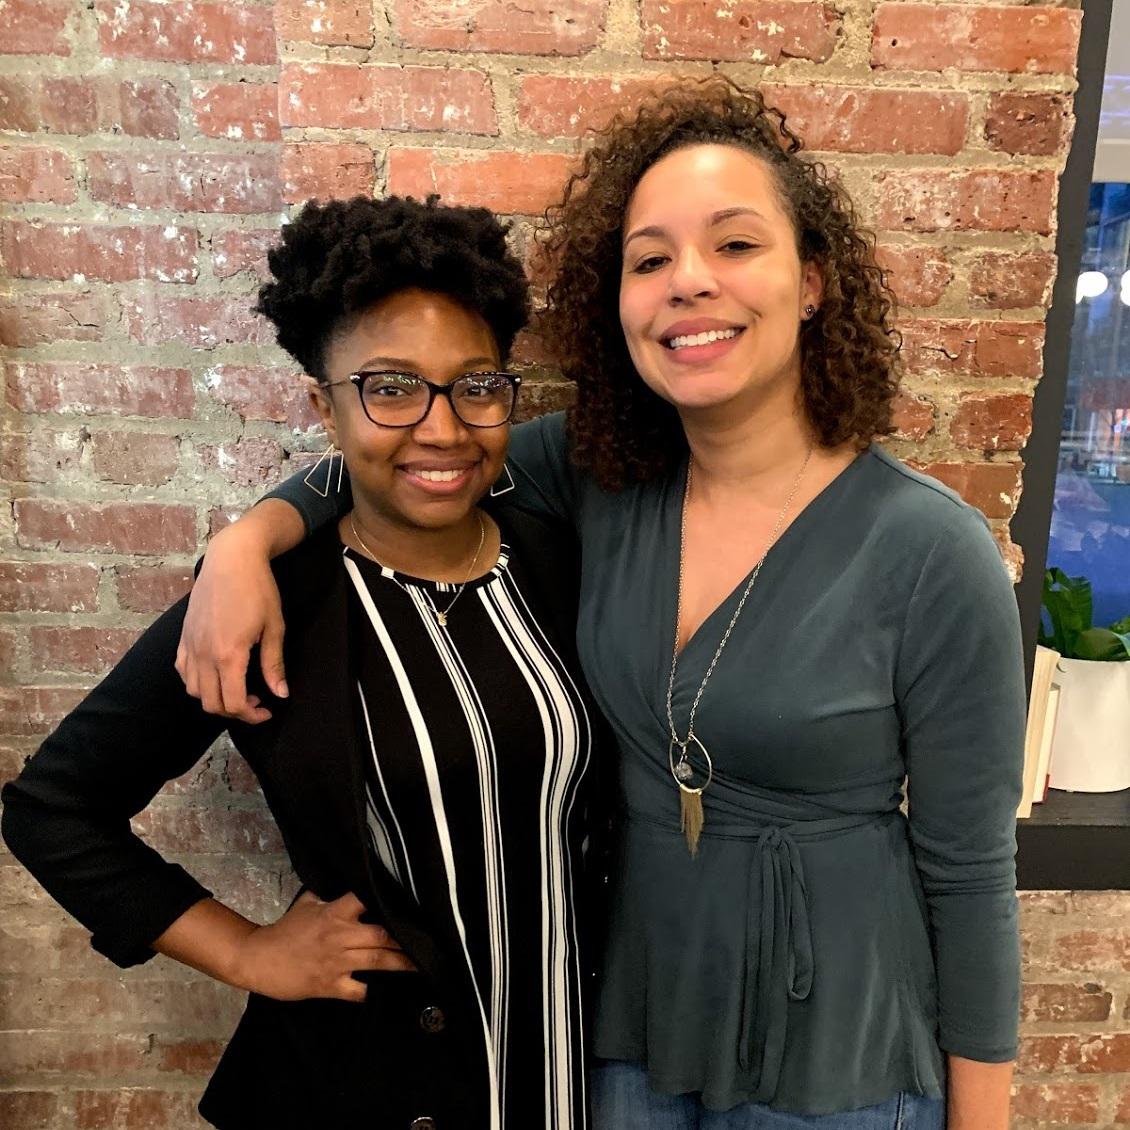 Trinique and I at our Diversify Dietetics MeetUP in Philadelphia!